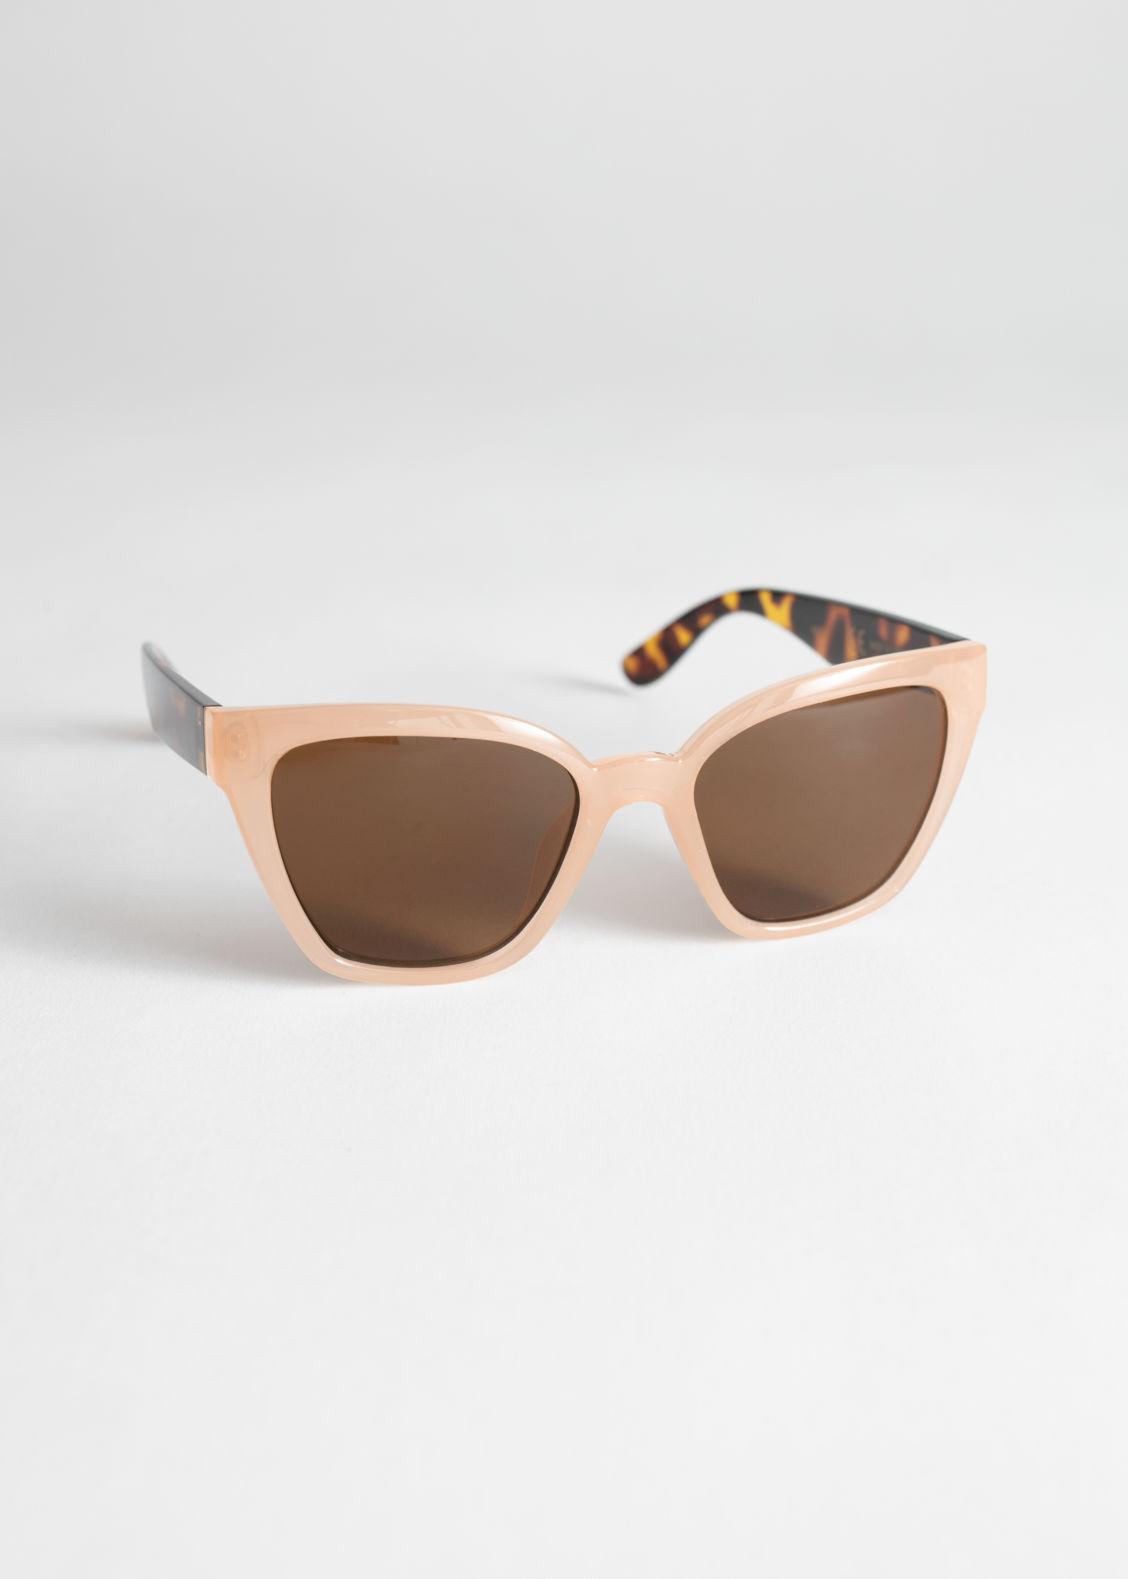 a01611d0cf6d6a Cat Eye Sunglasses - Orange - Cat-eye -   Other Stories